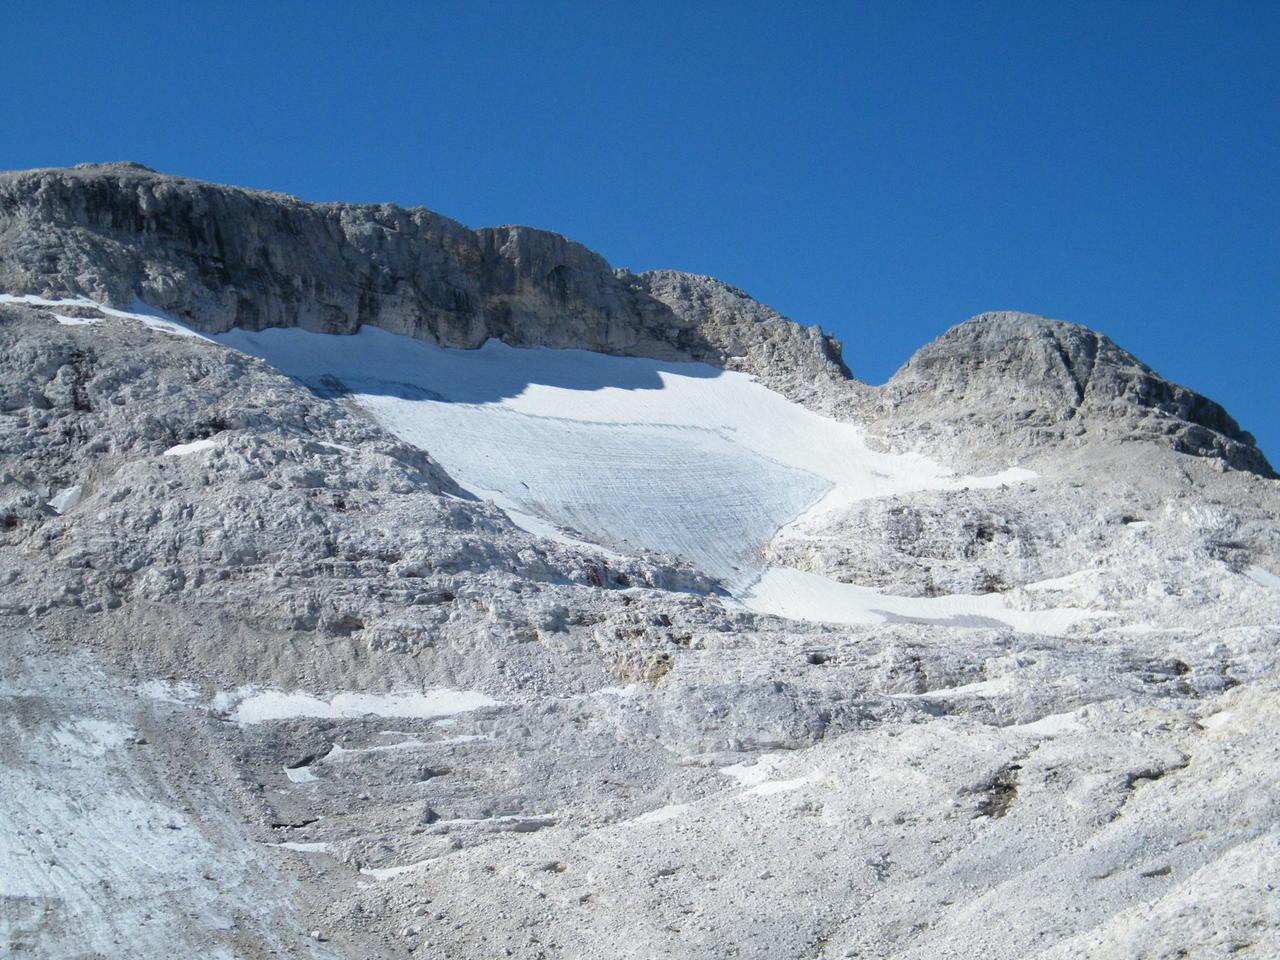 ghiacciaio della fradusta-dscf6384.jpg